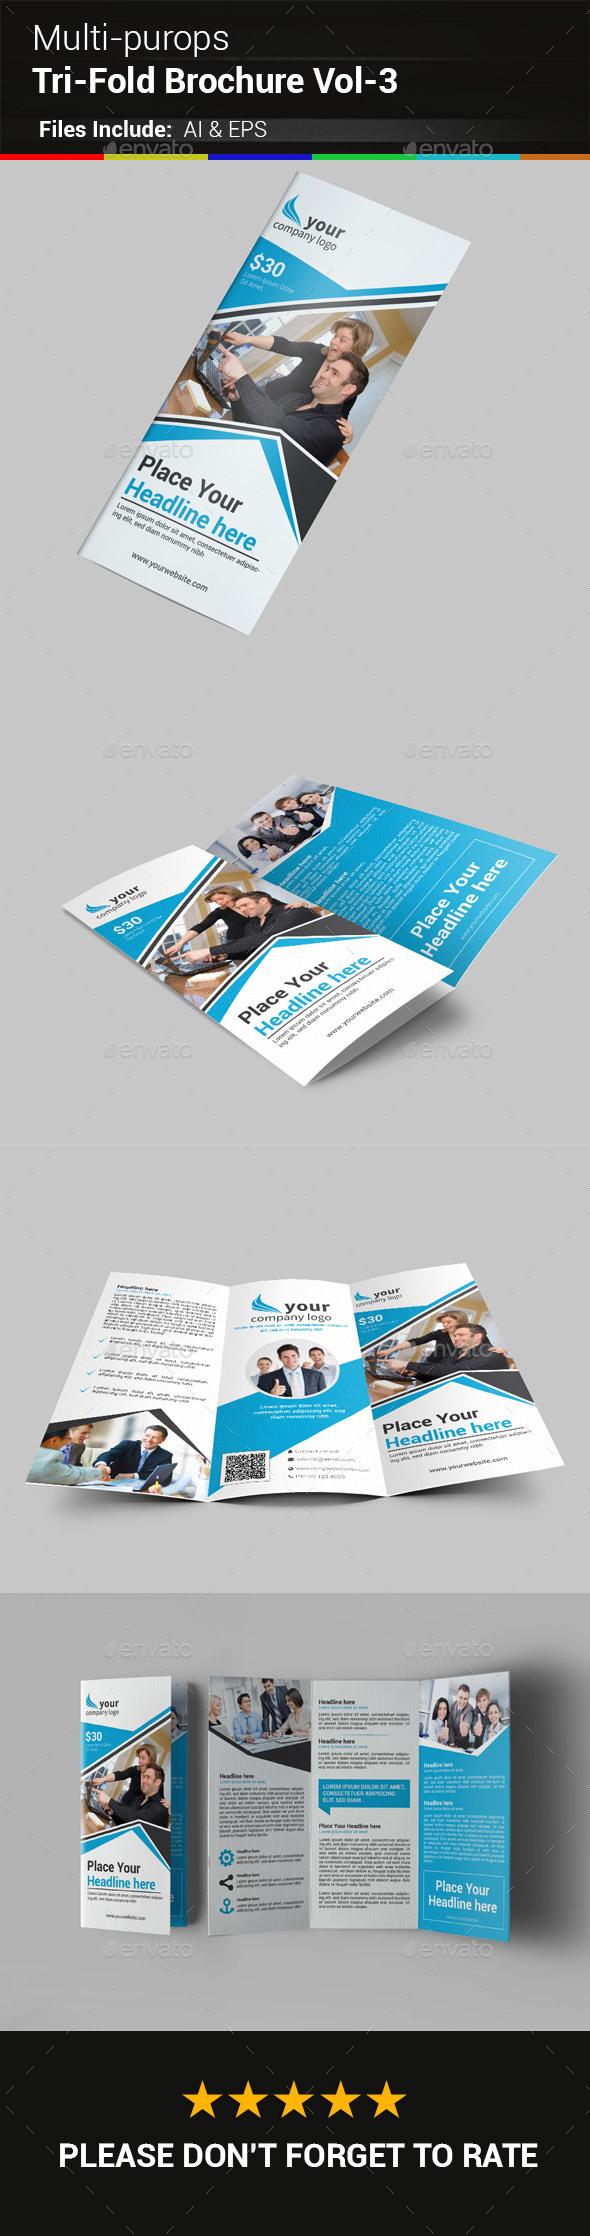 Multipurpose Business Tri-Fold Brochure Vol-3 - Corporate Brochures